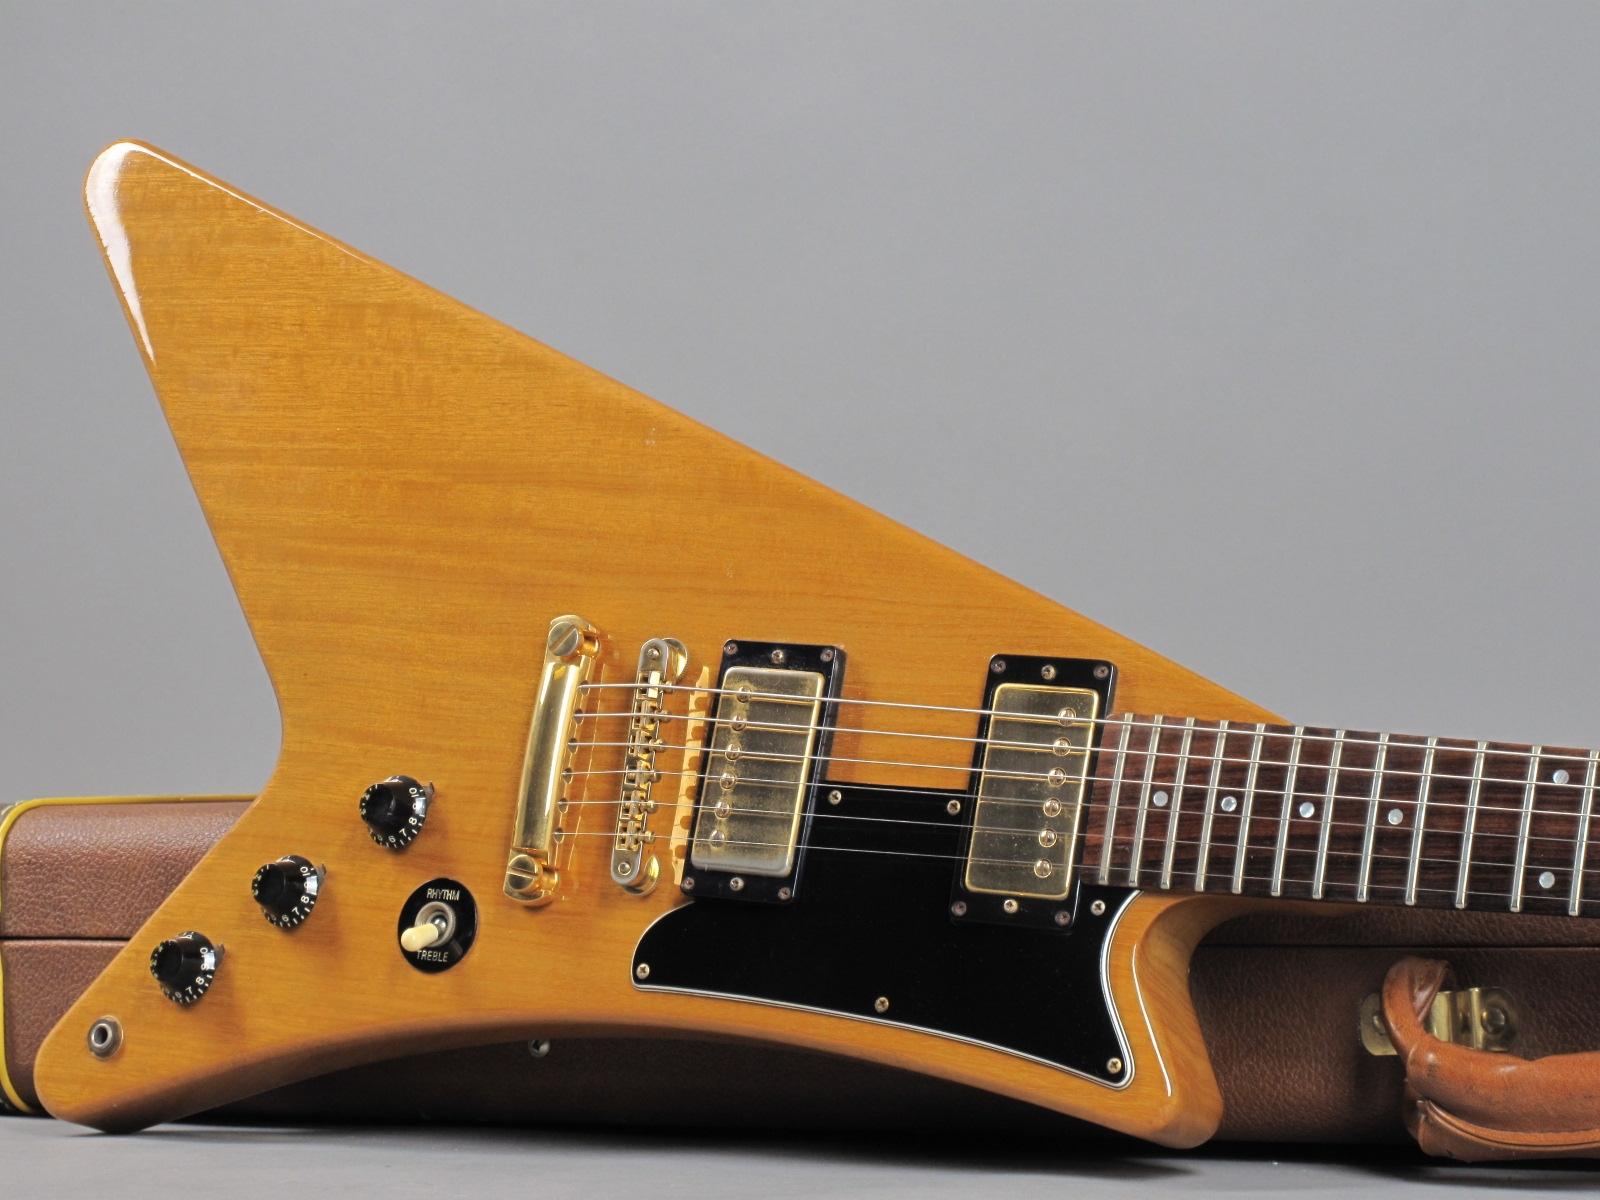 https://guitarpoint.de/app/uploads/products/1983-gibson-moderne-korina-heritage-natural/1983-Gibson-Moderne-Korina-C058_19.jpg